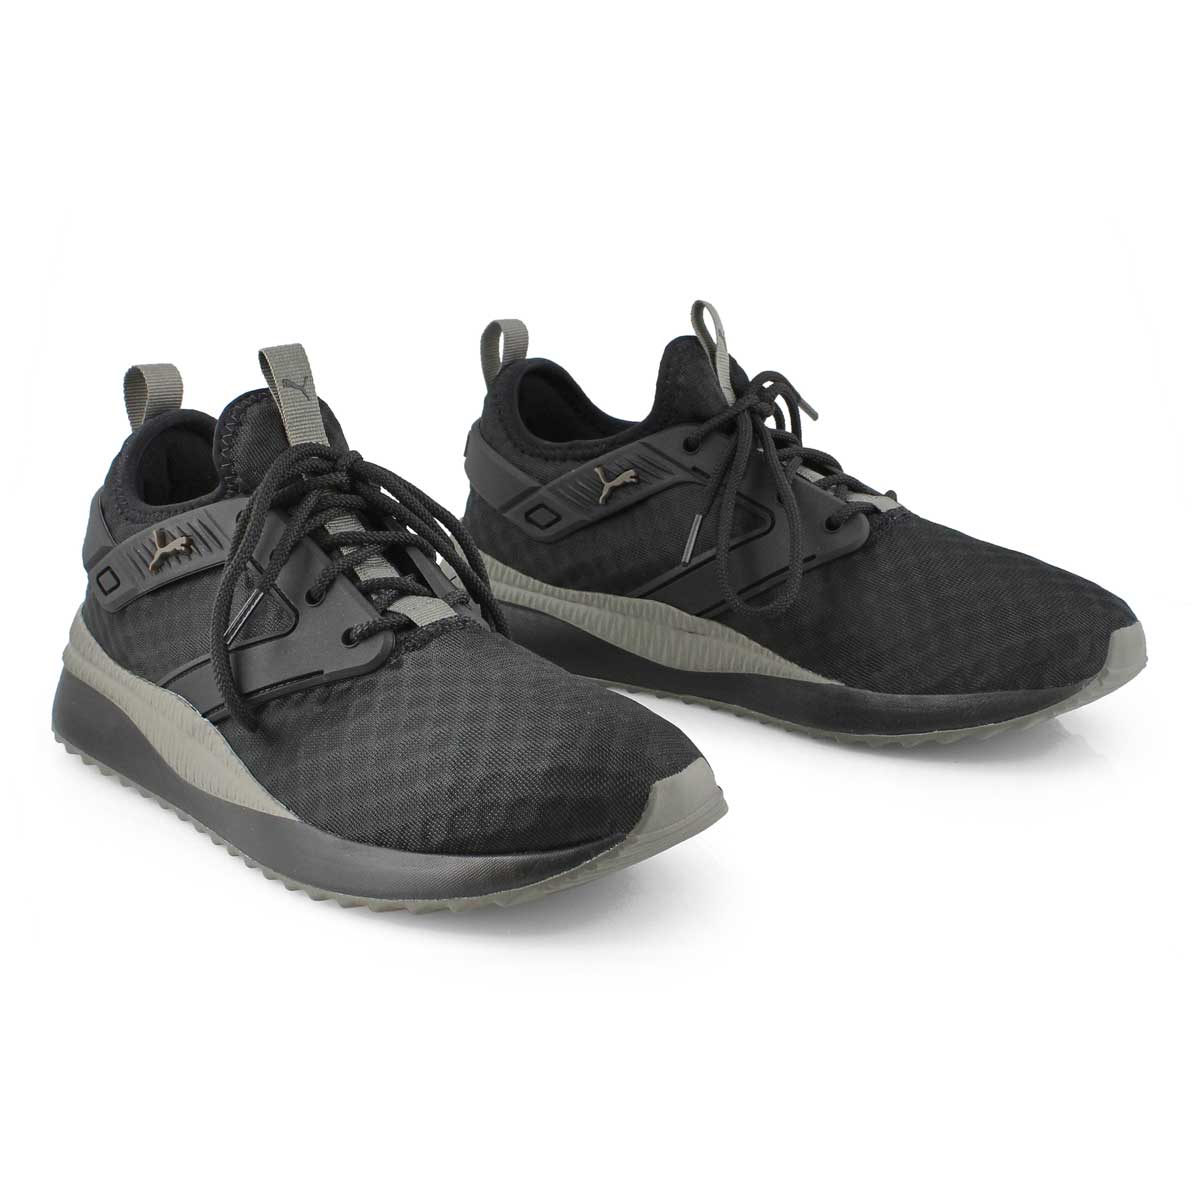 Men's Pacer Next Excel Sneaker - Black